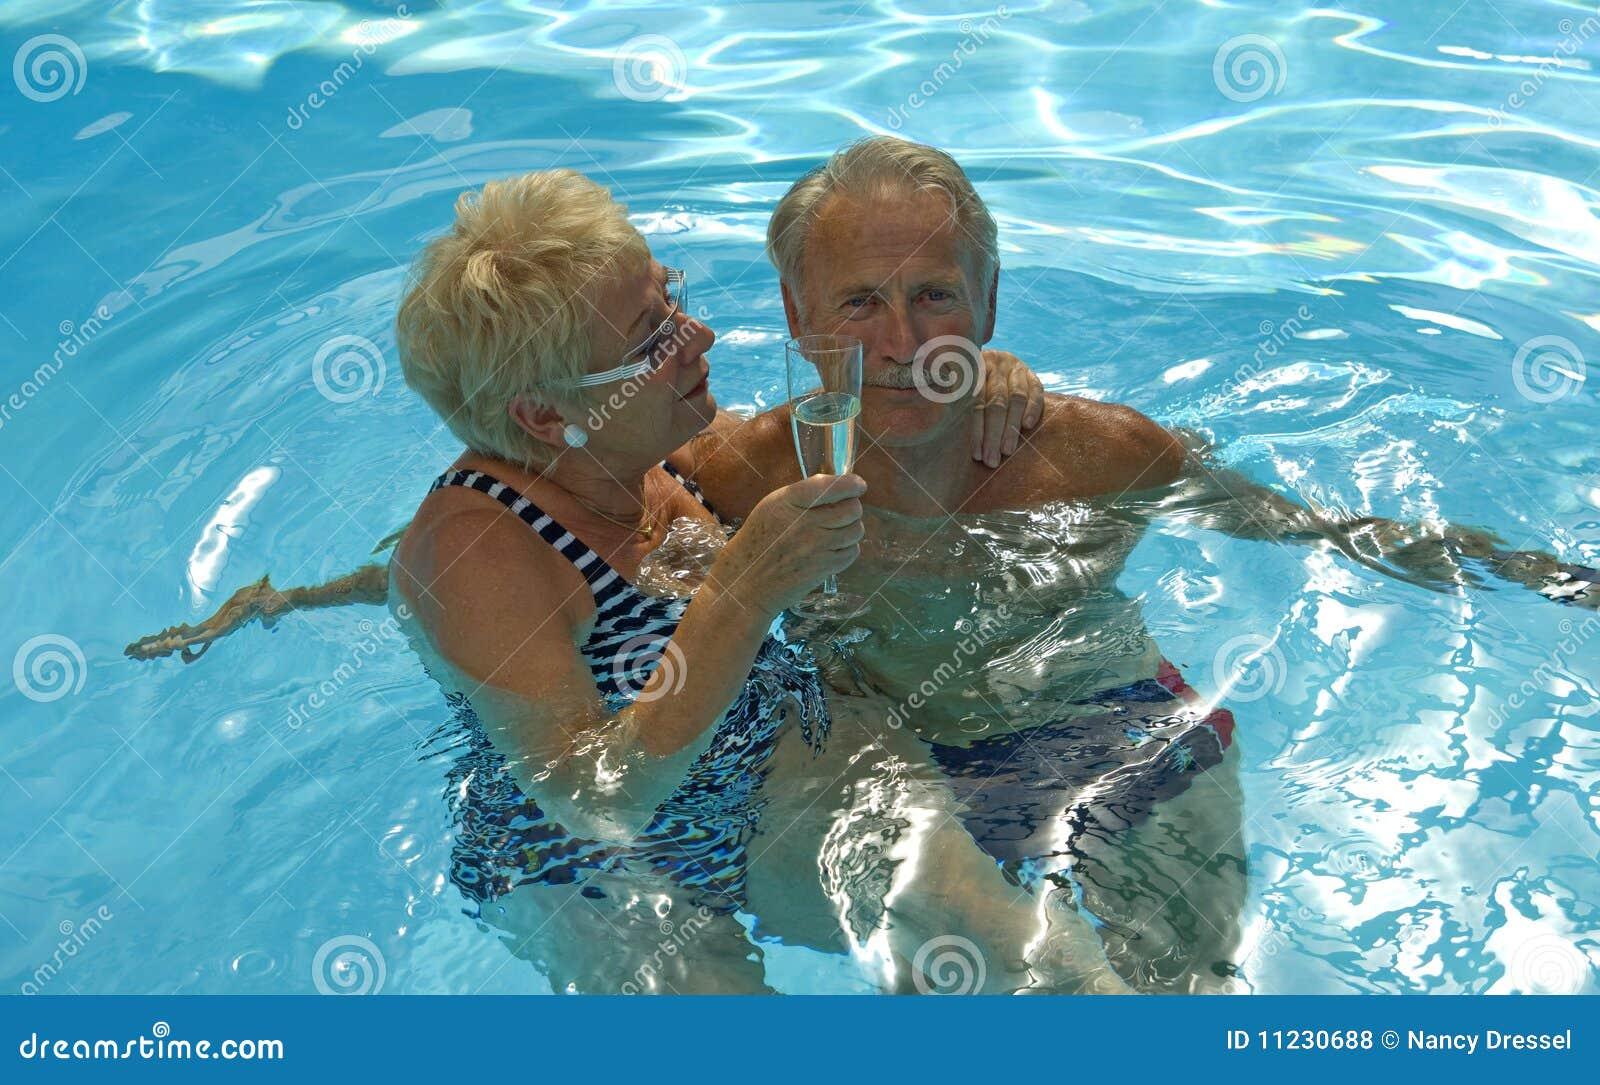 Happy hour in pool